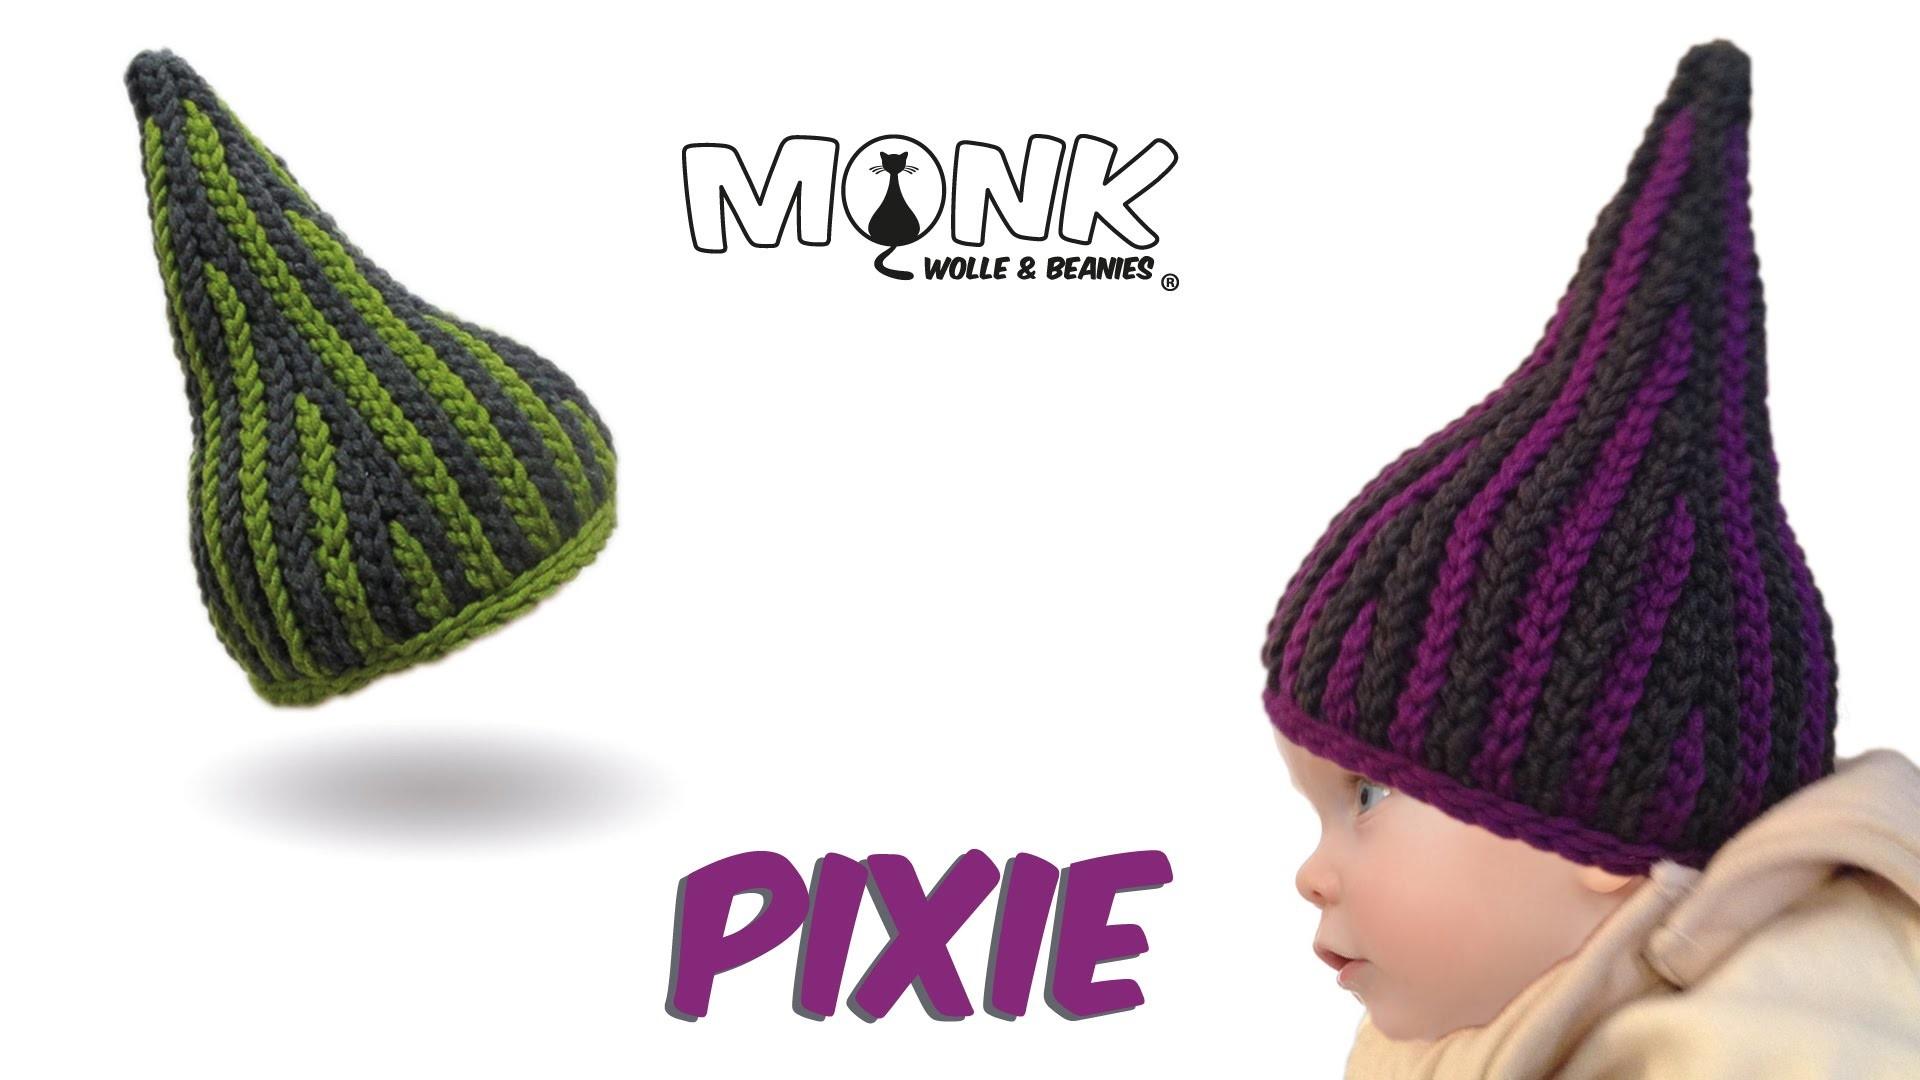 Mütze bosnisch häkeln - Pixie Babymütze - Kettmaschen häkeln